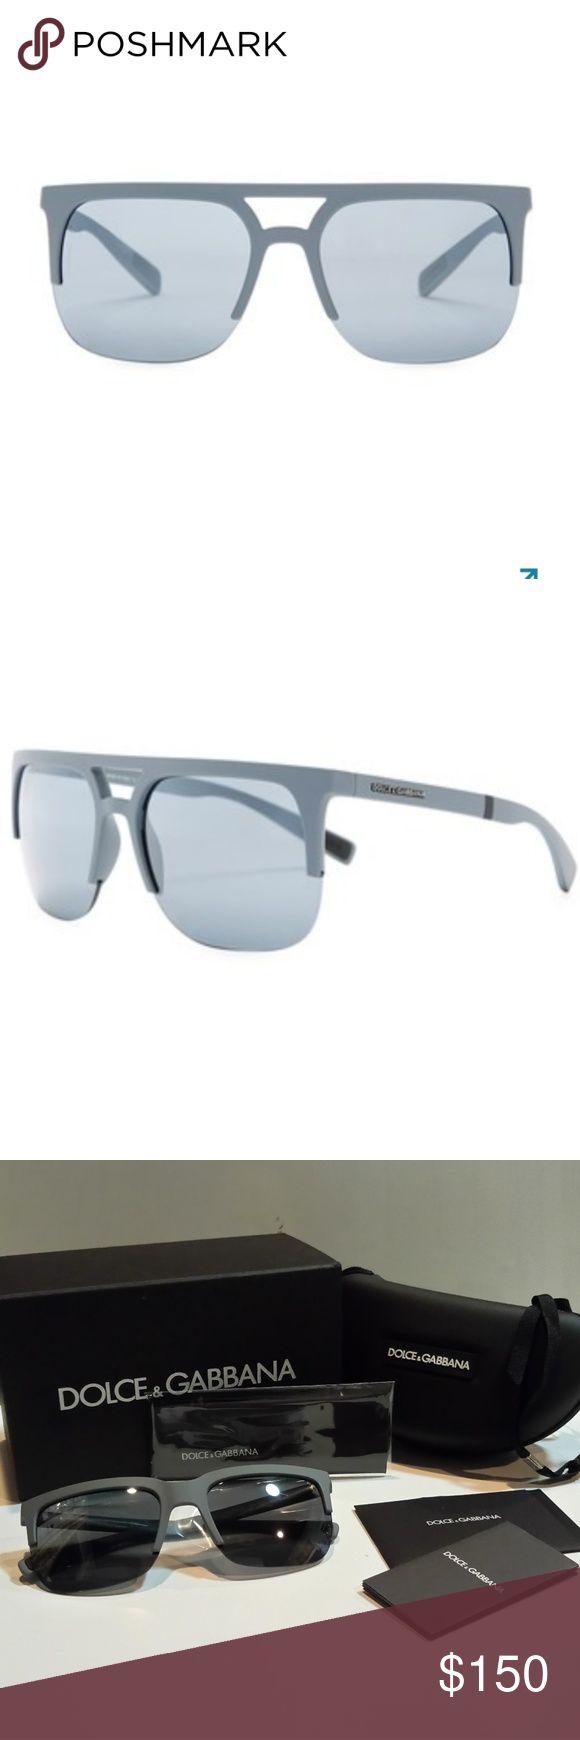 33 best Dolce & Gabbana Sunglasses images on Pinterest ...